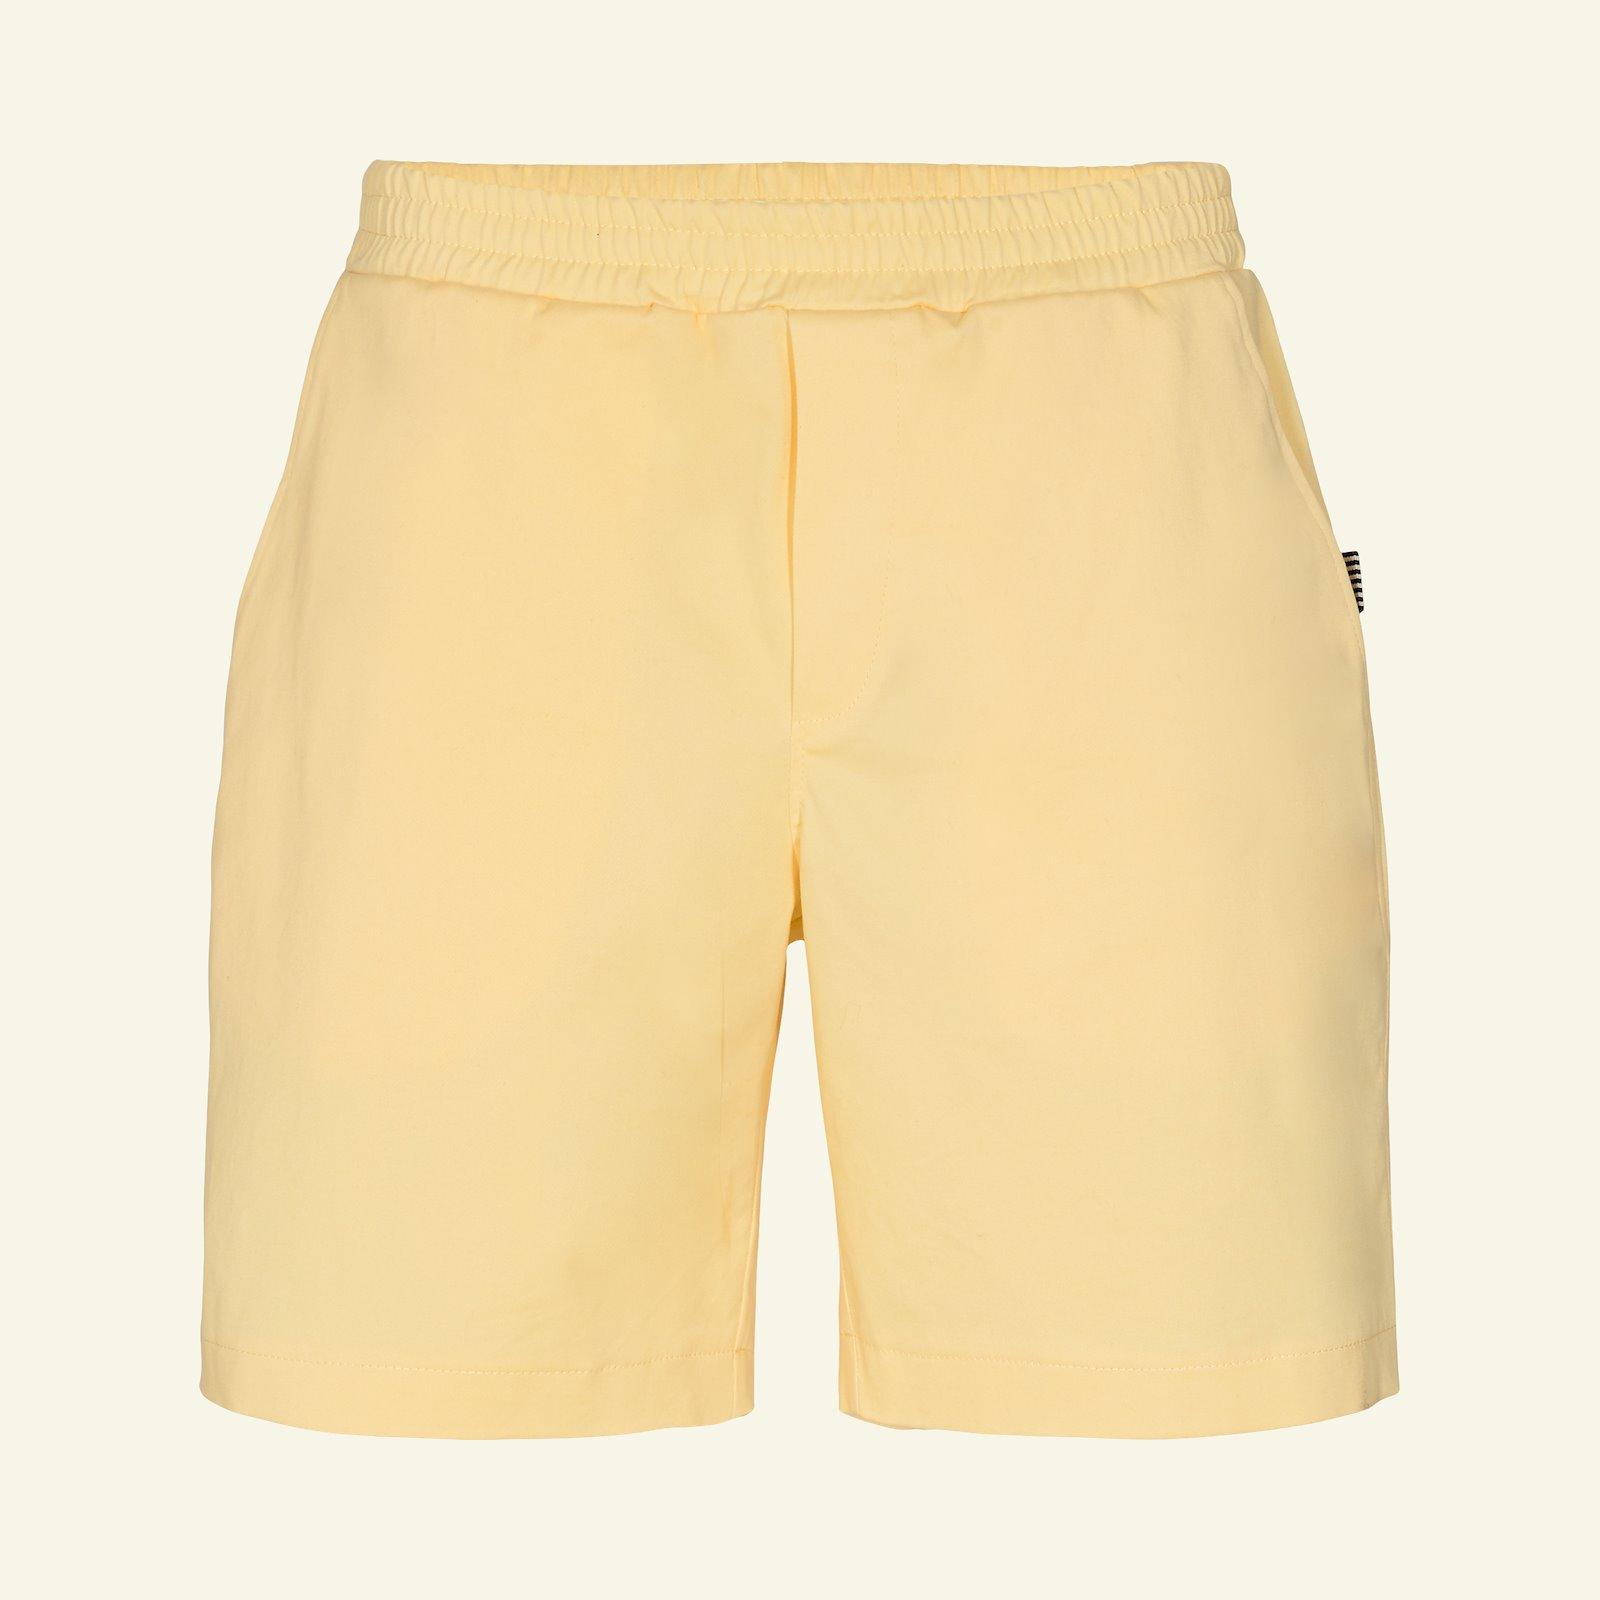 Shorts, 54/26 p85002_420416_3504001_21330_sskit